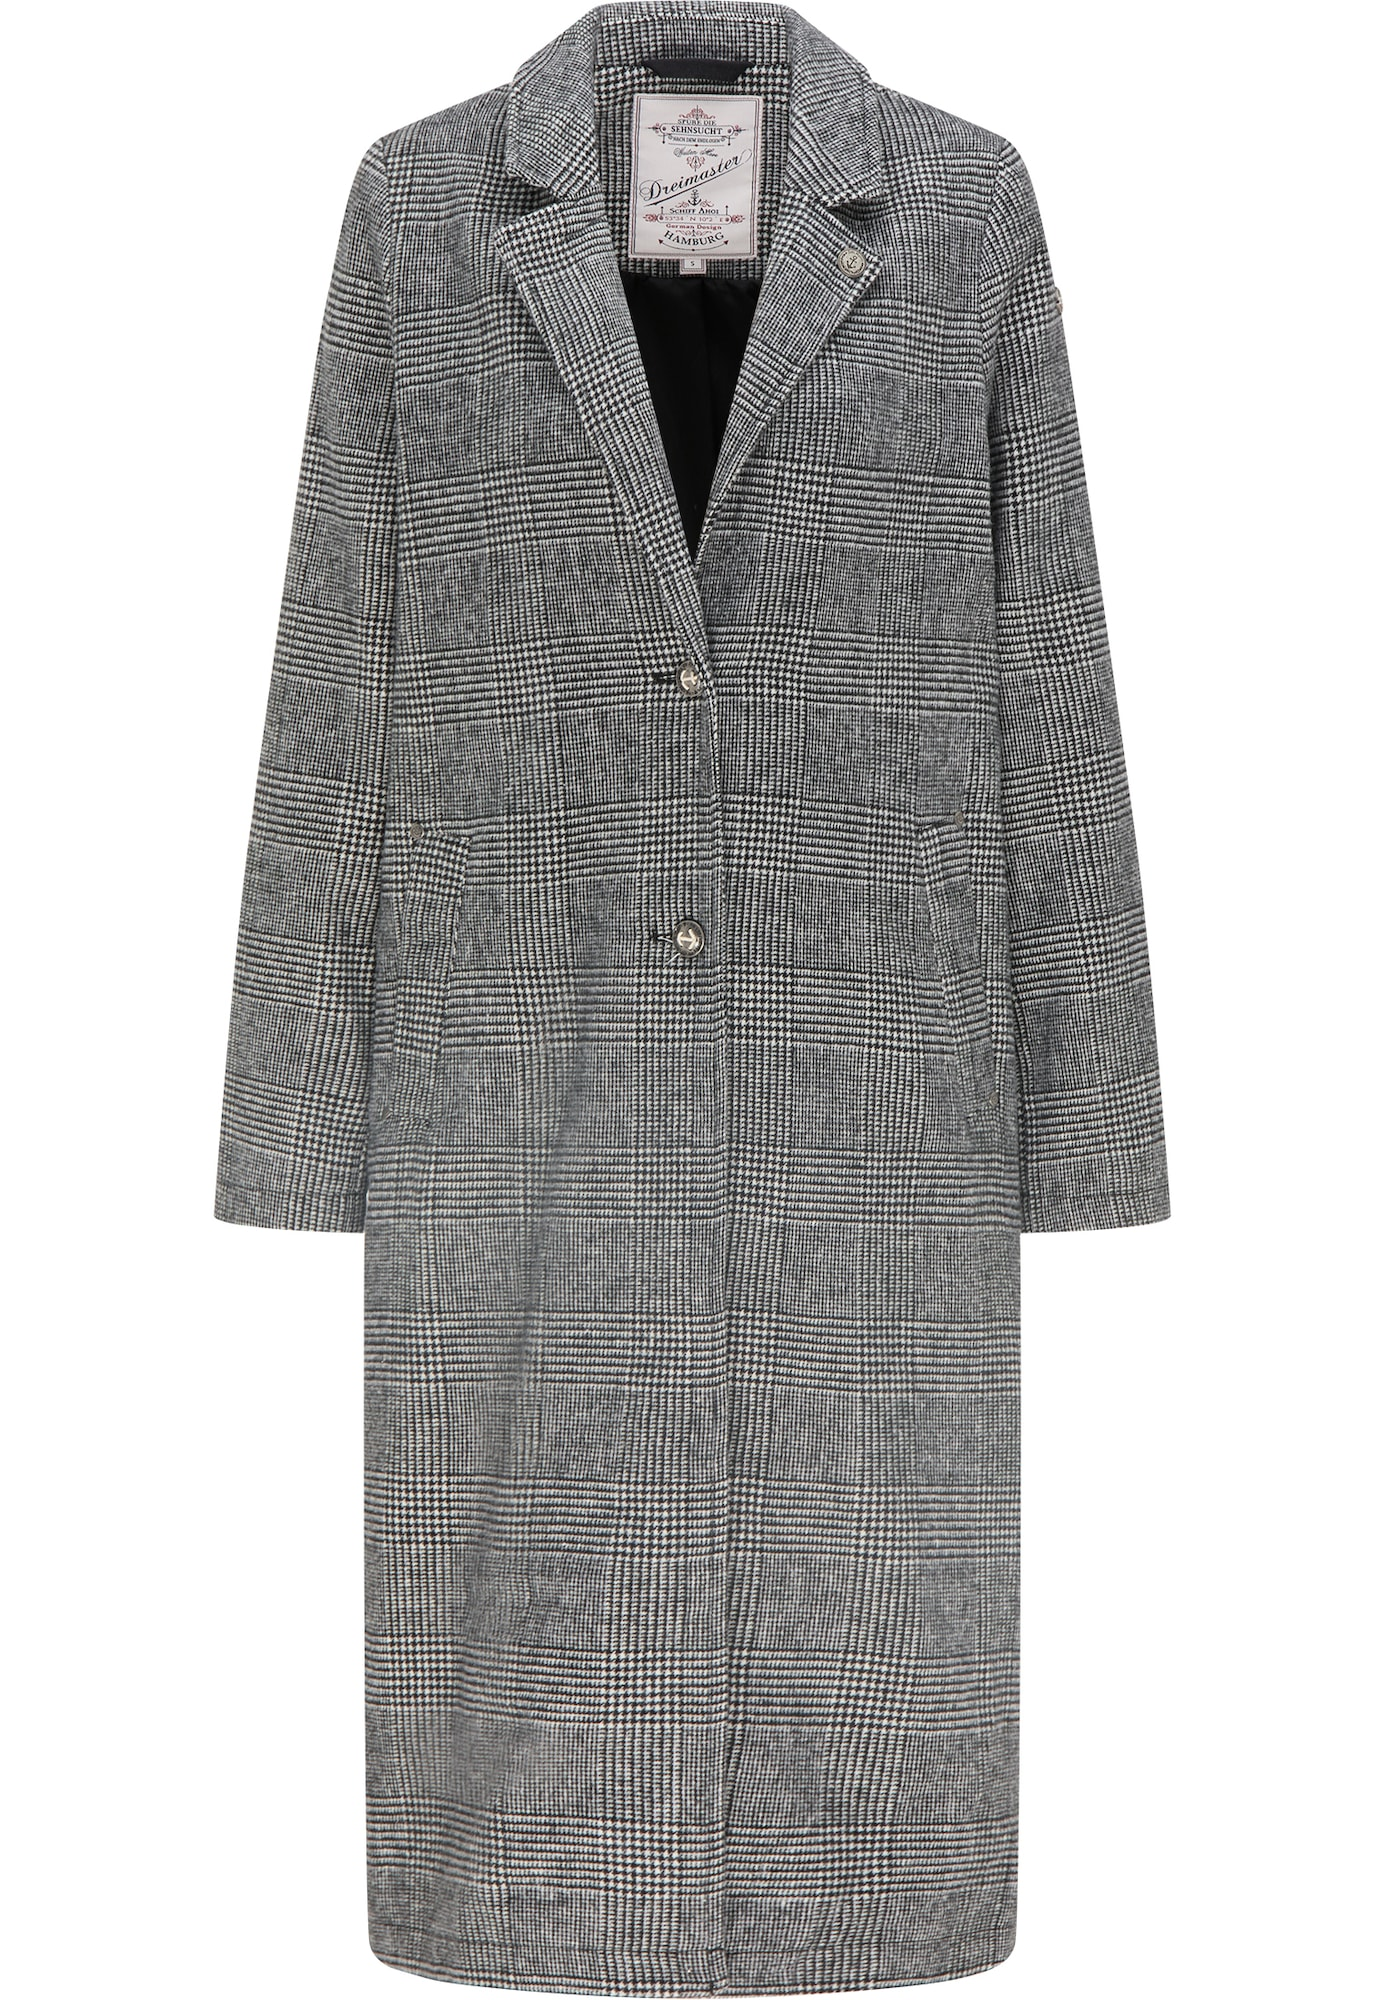 DreiMaster Vintage Demisezoninis paltas juoda / balta